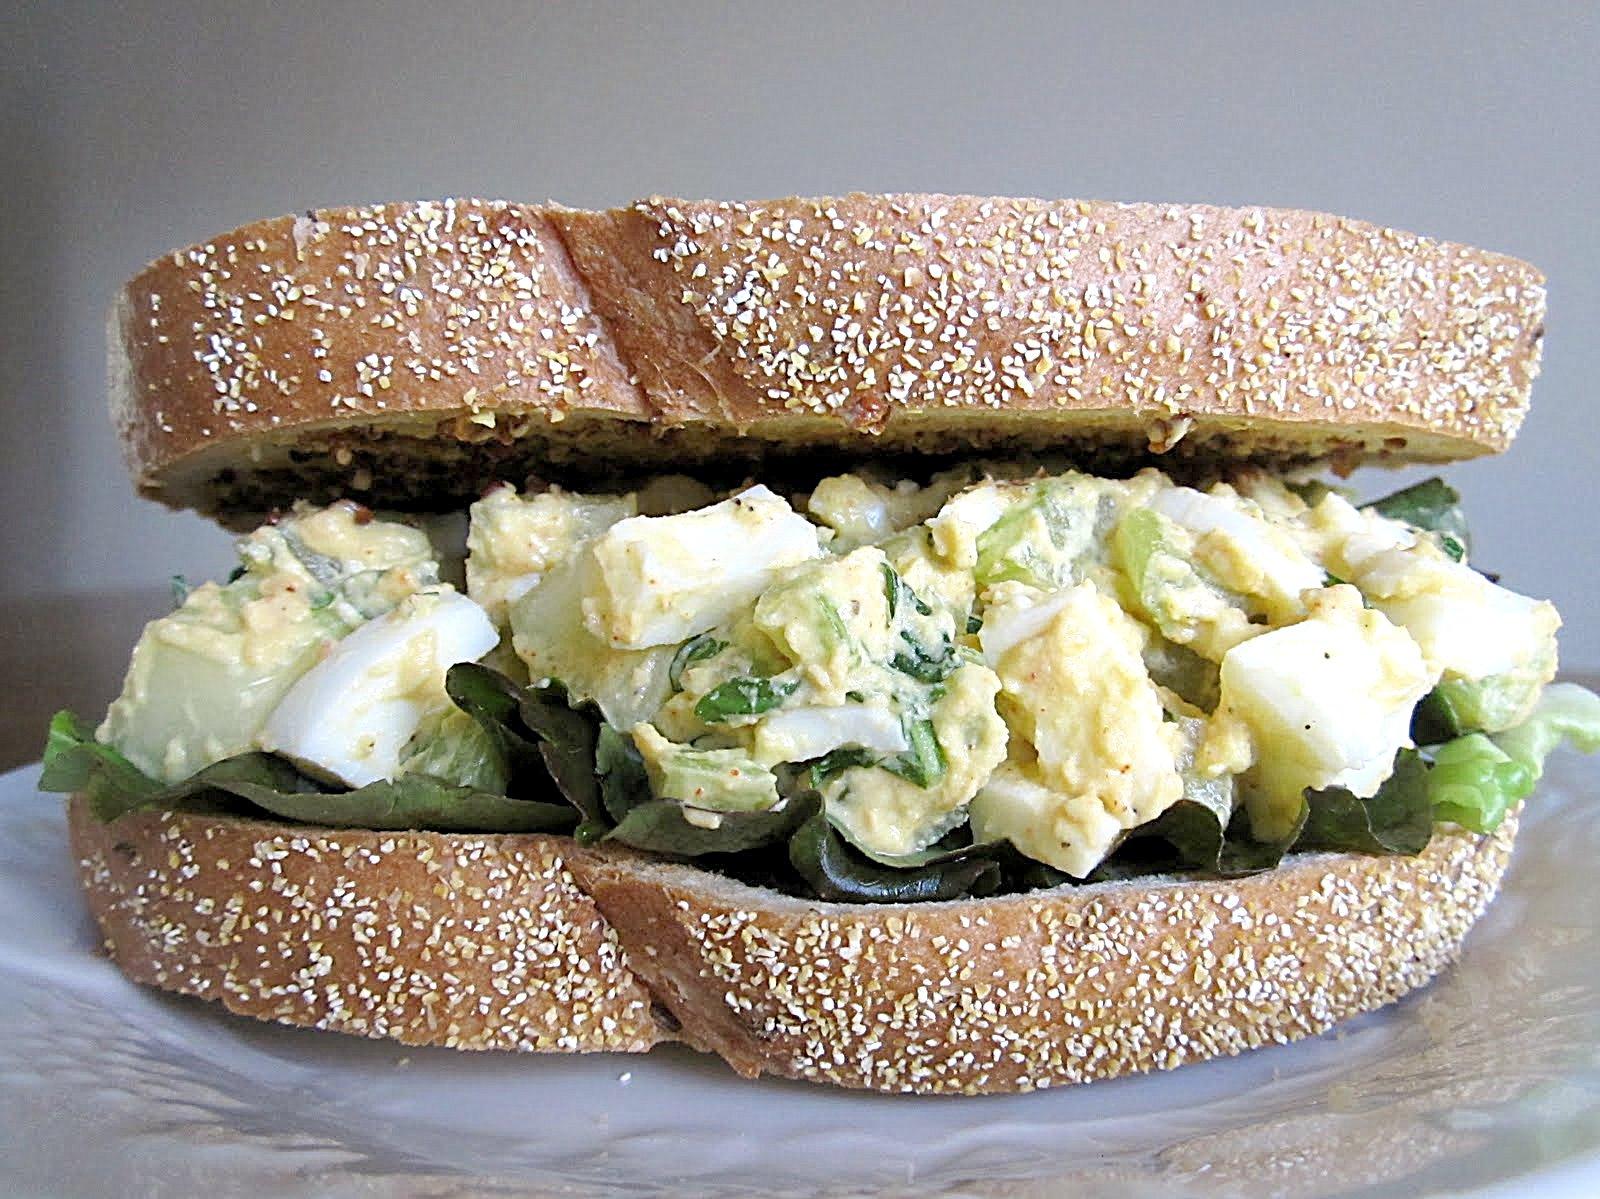 Chomping Board: Basil cucumber egg salad sandwich